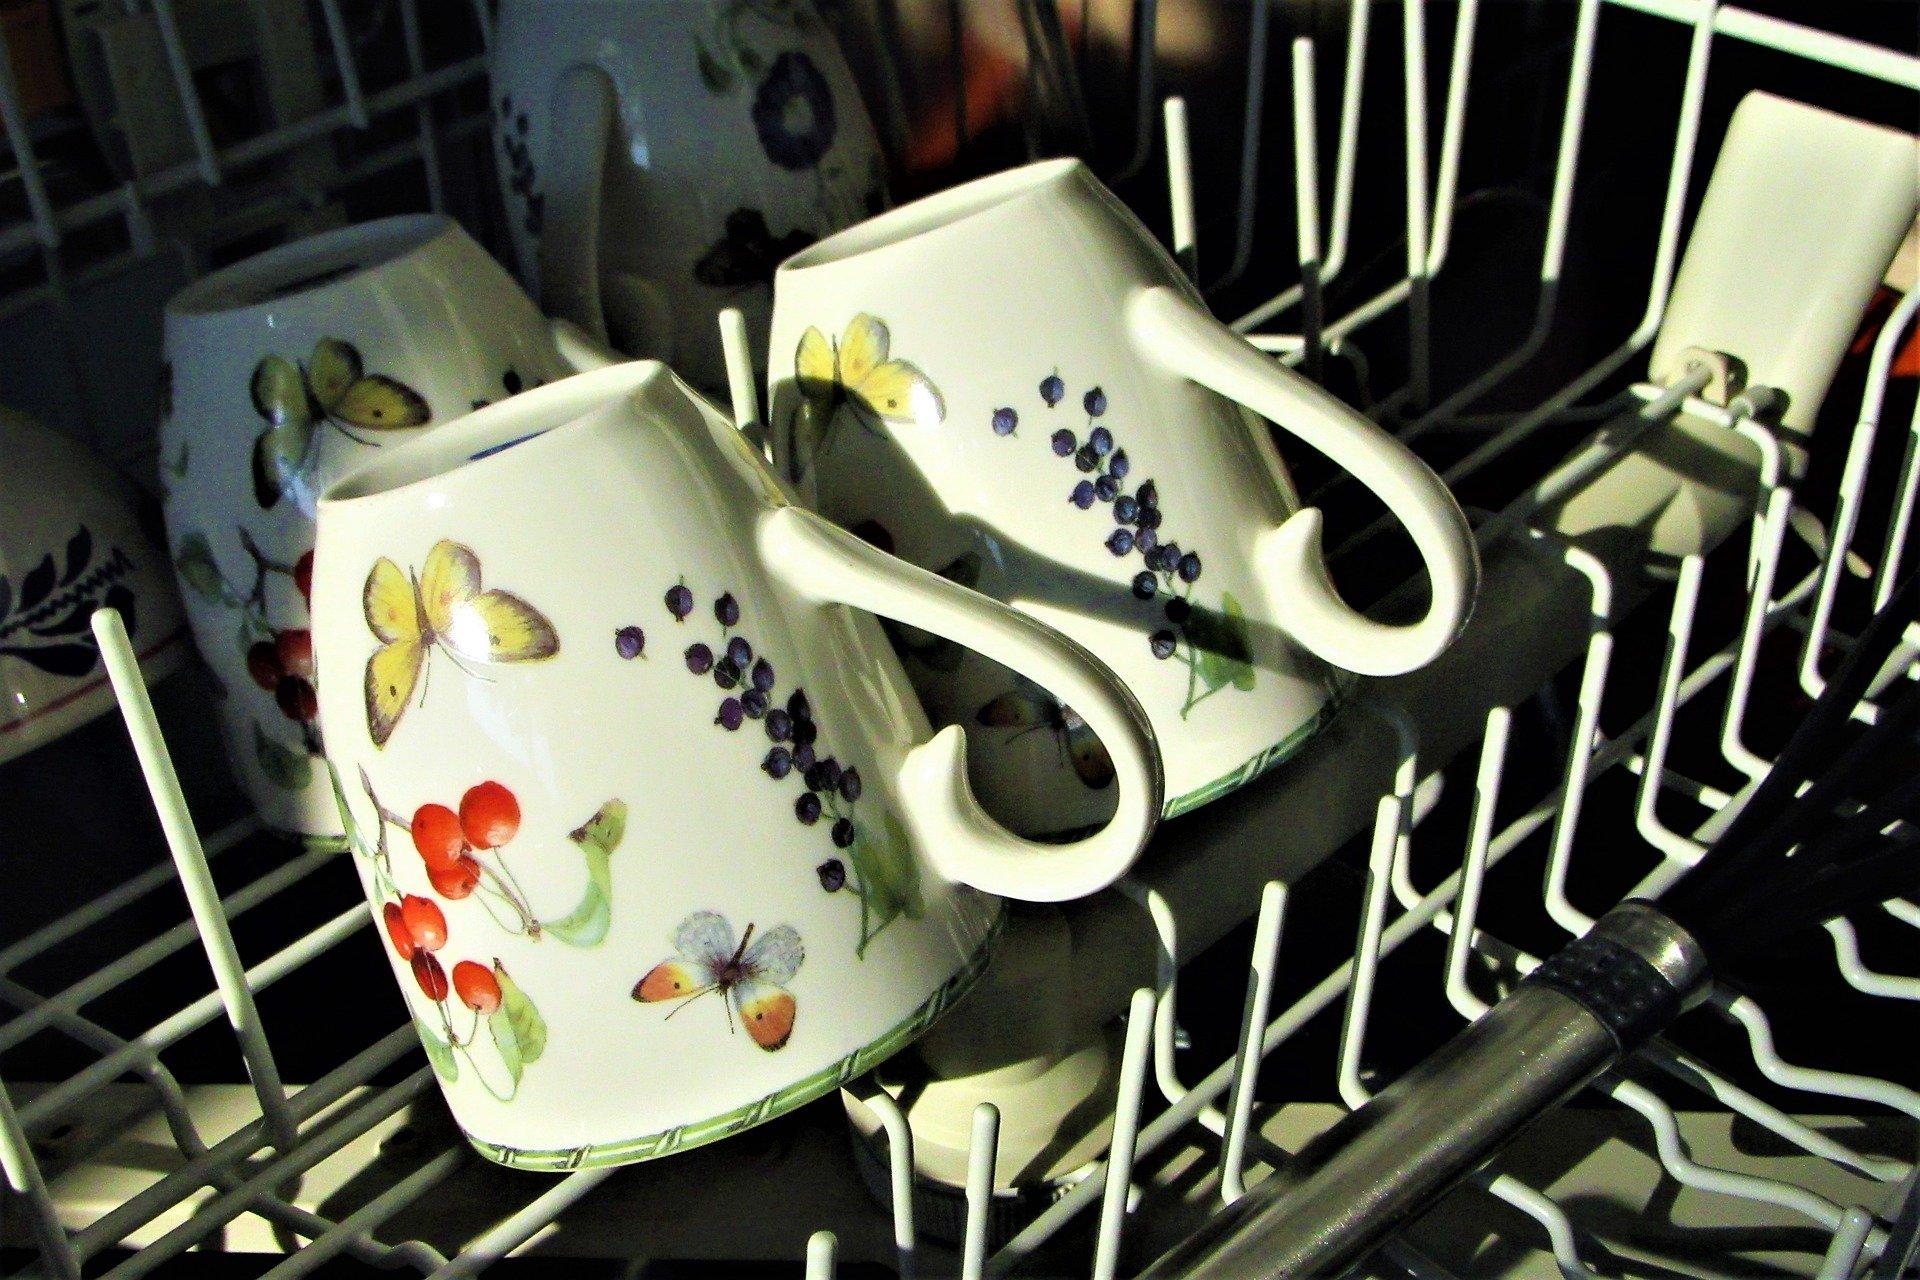 mugs in dishwasher